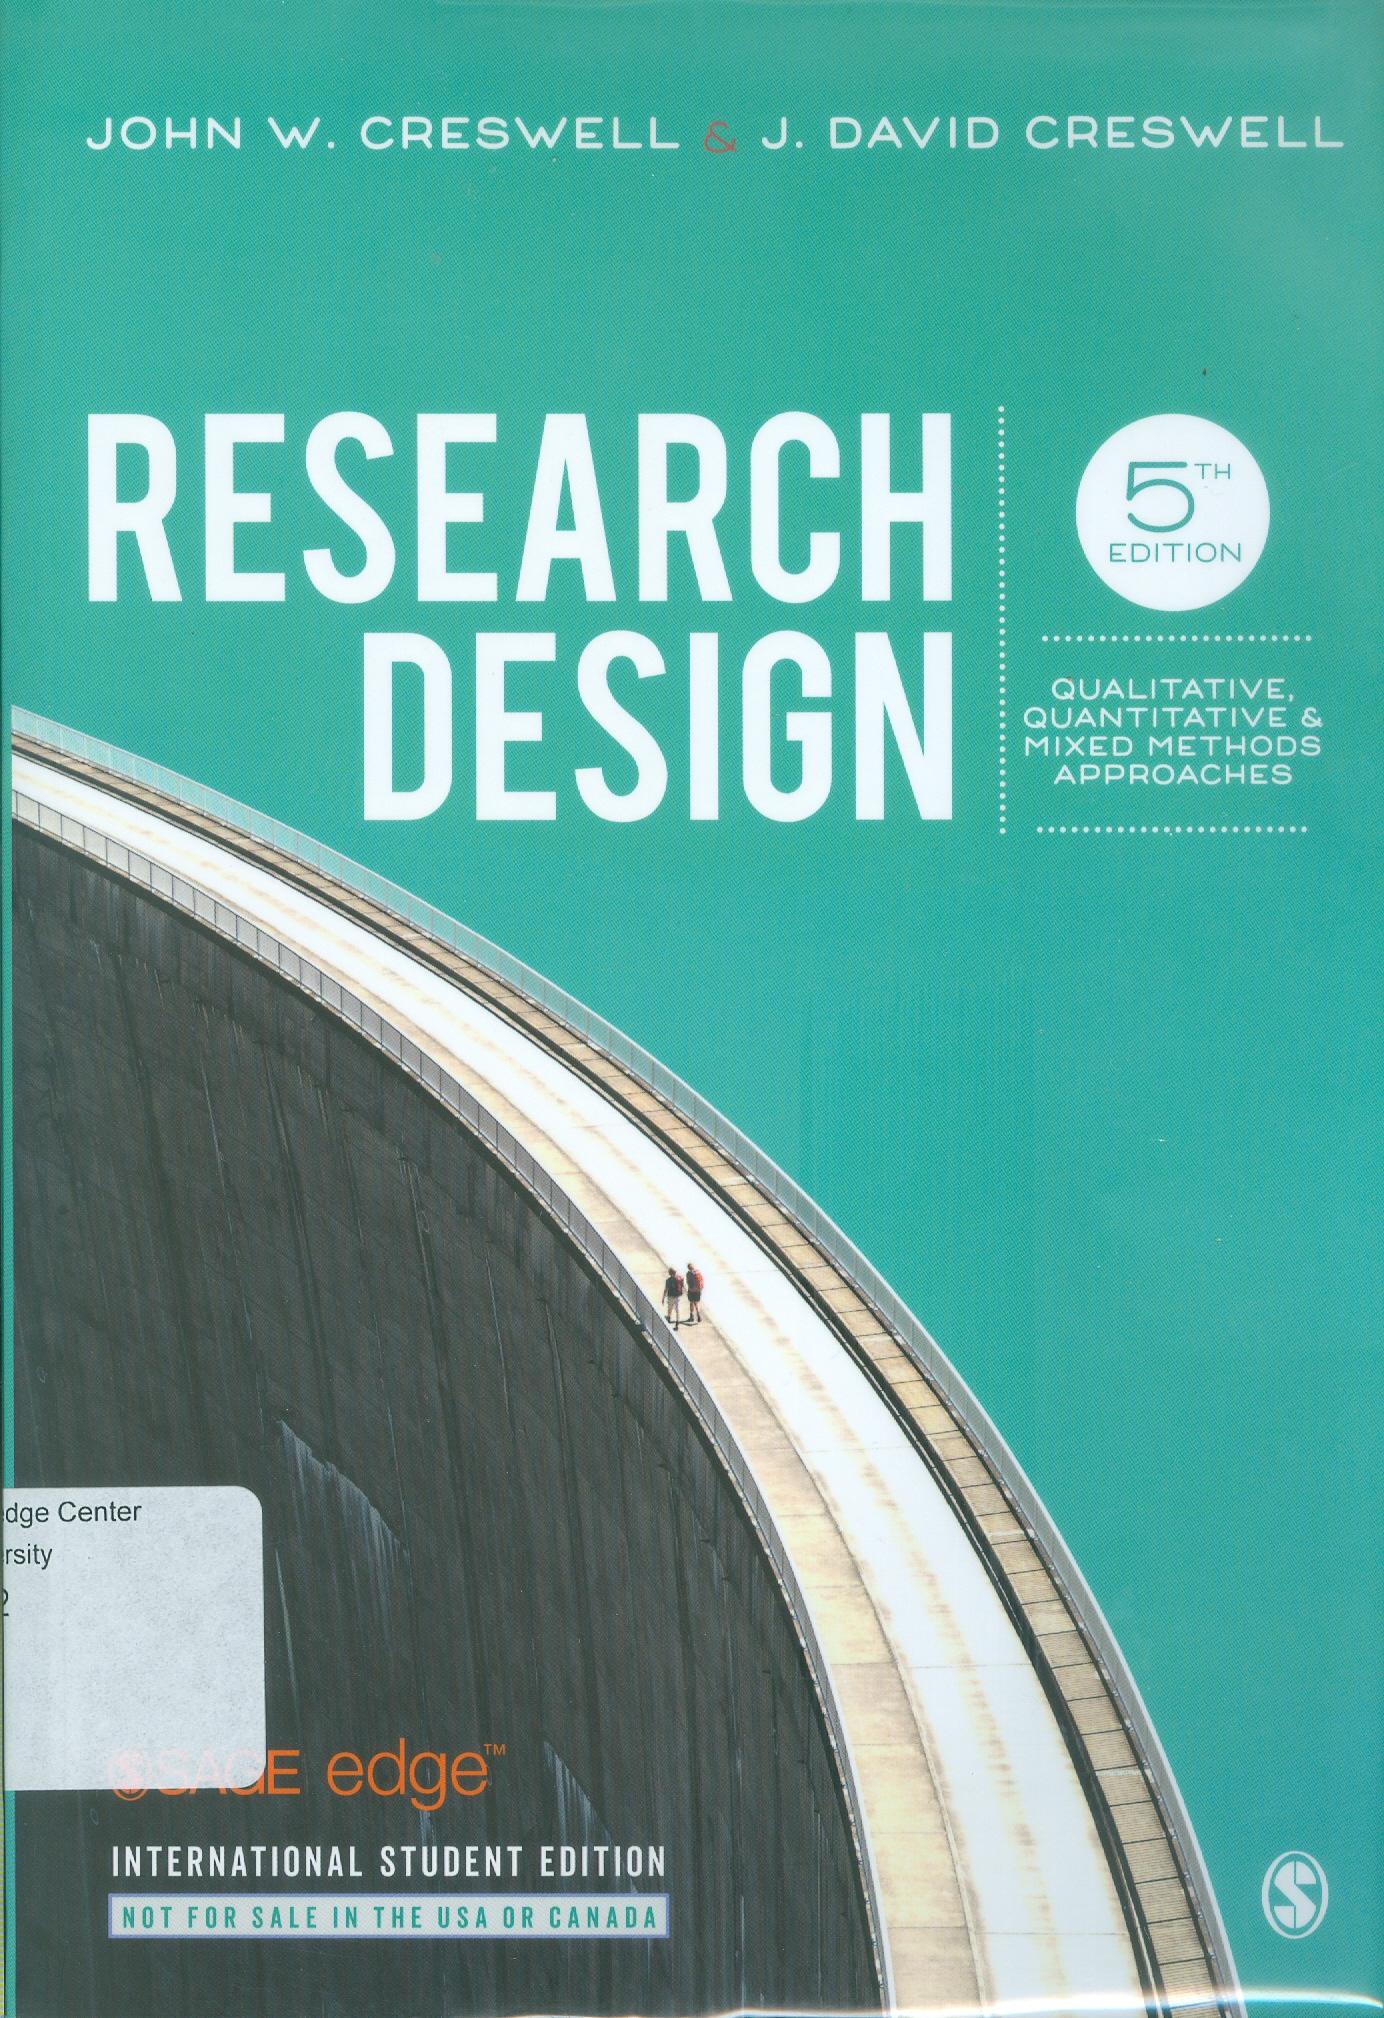 research design0001.jpg